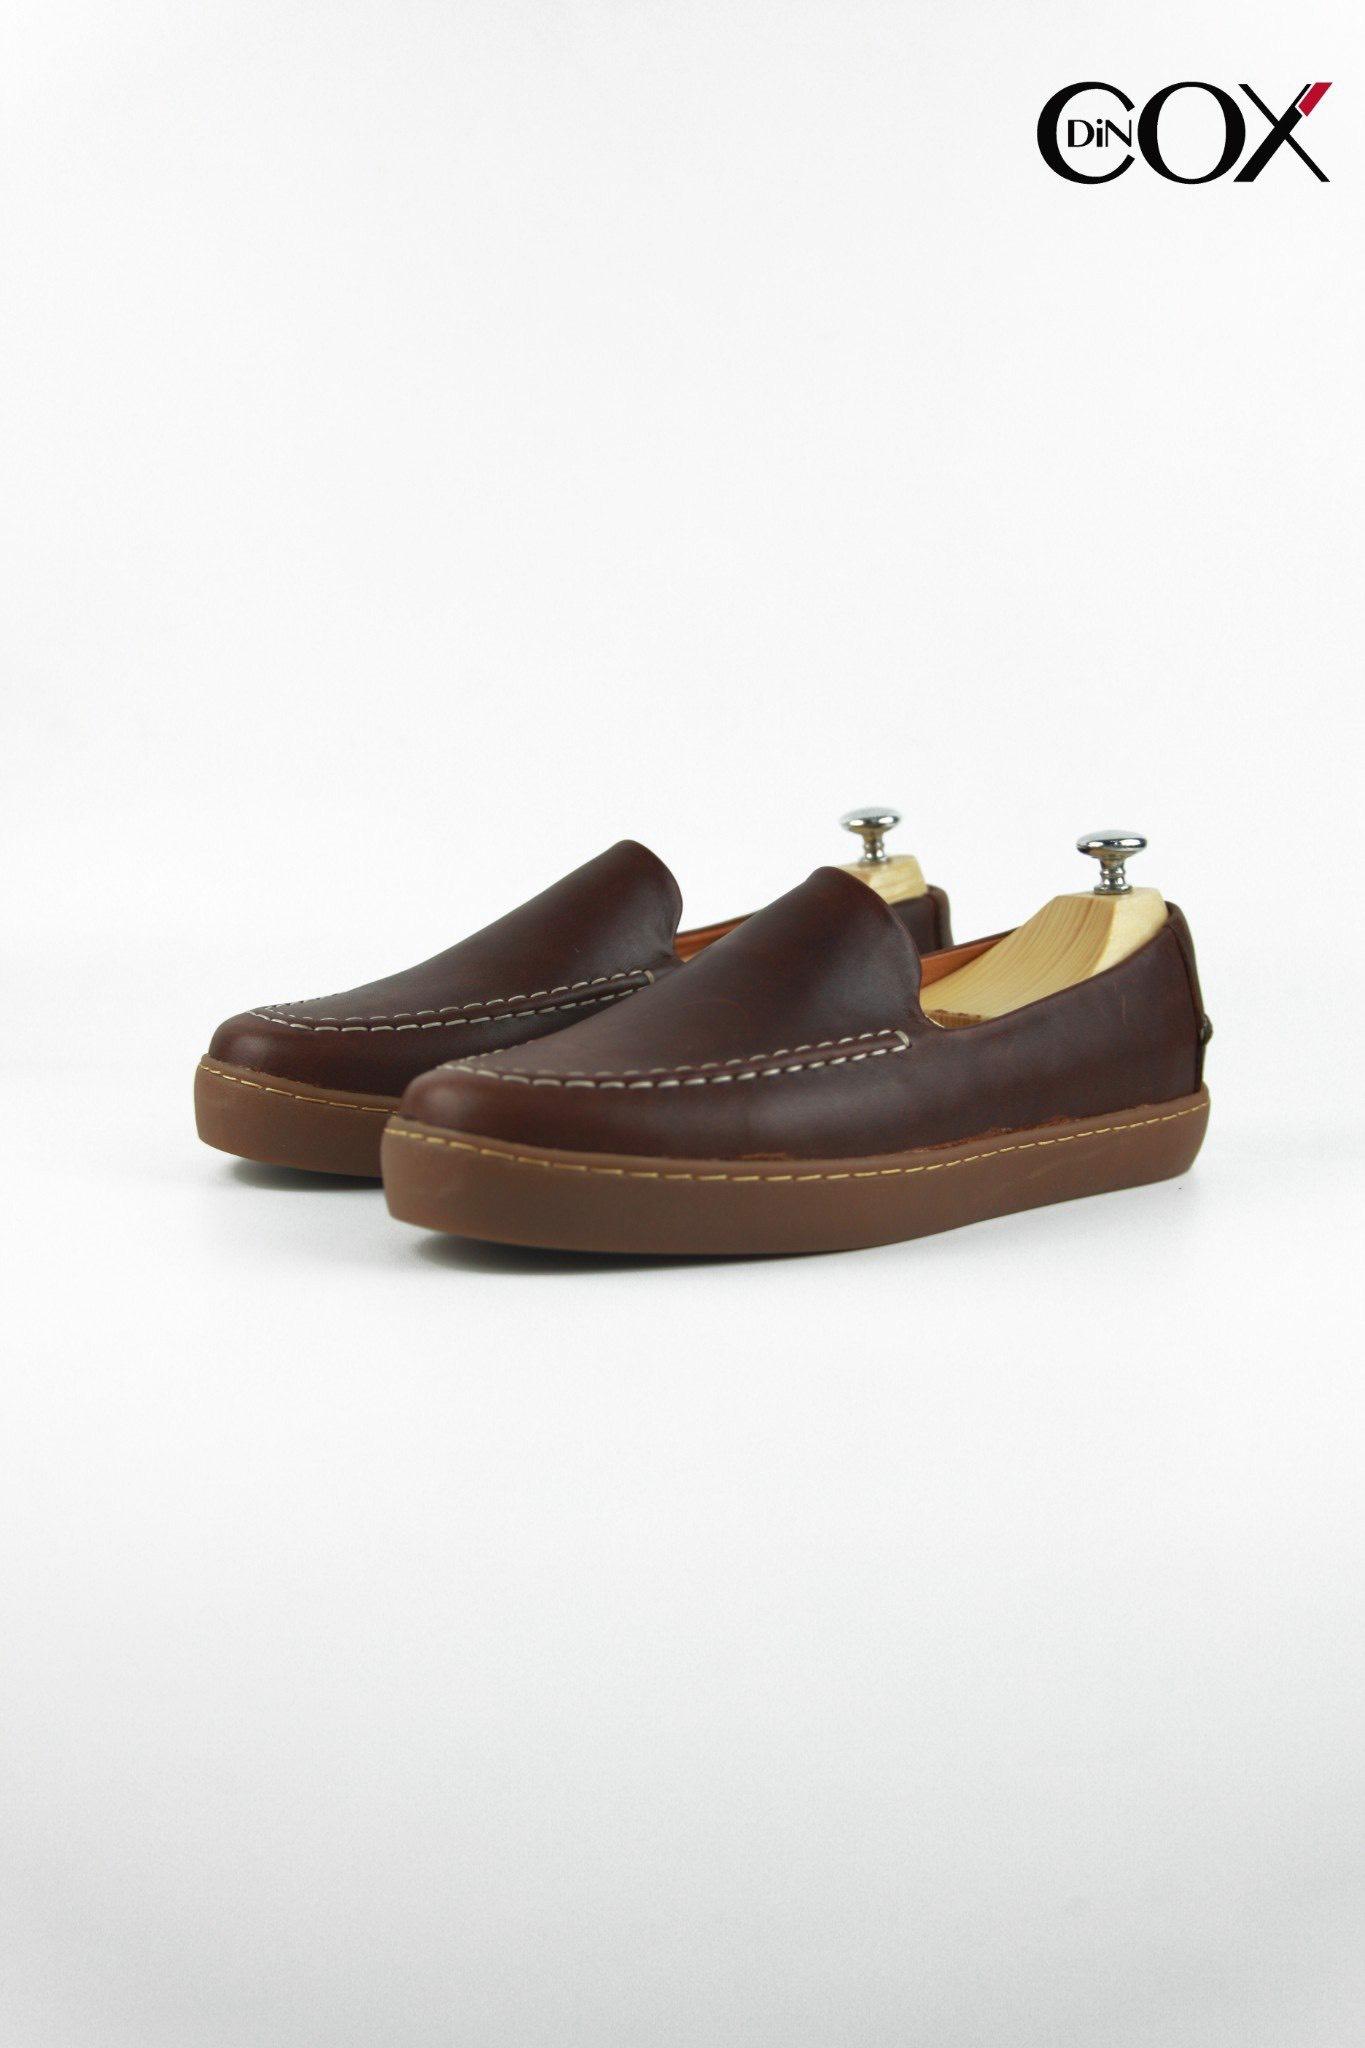 dincox-lc01-brown